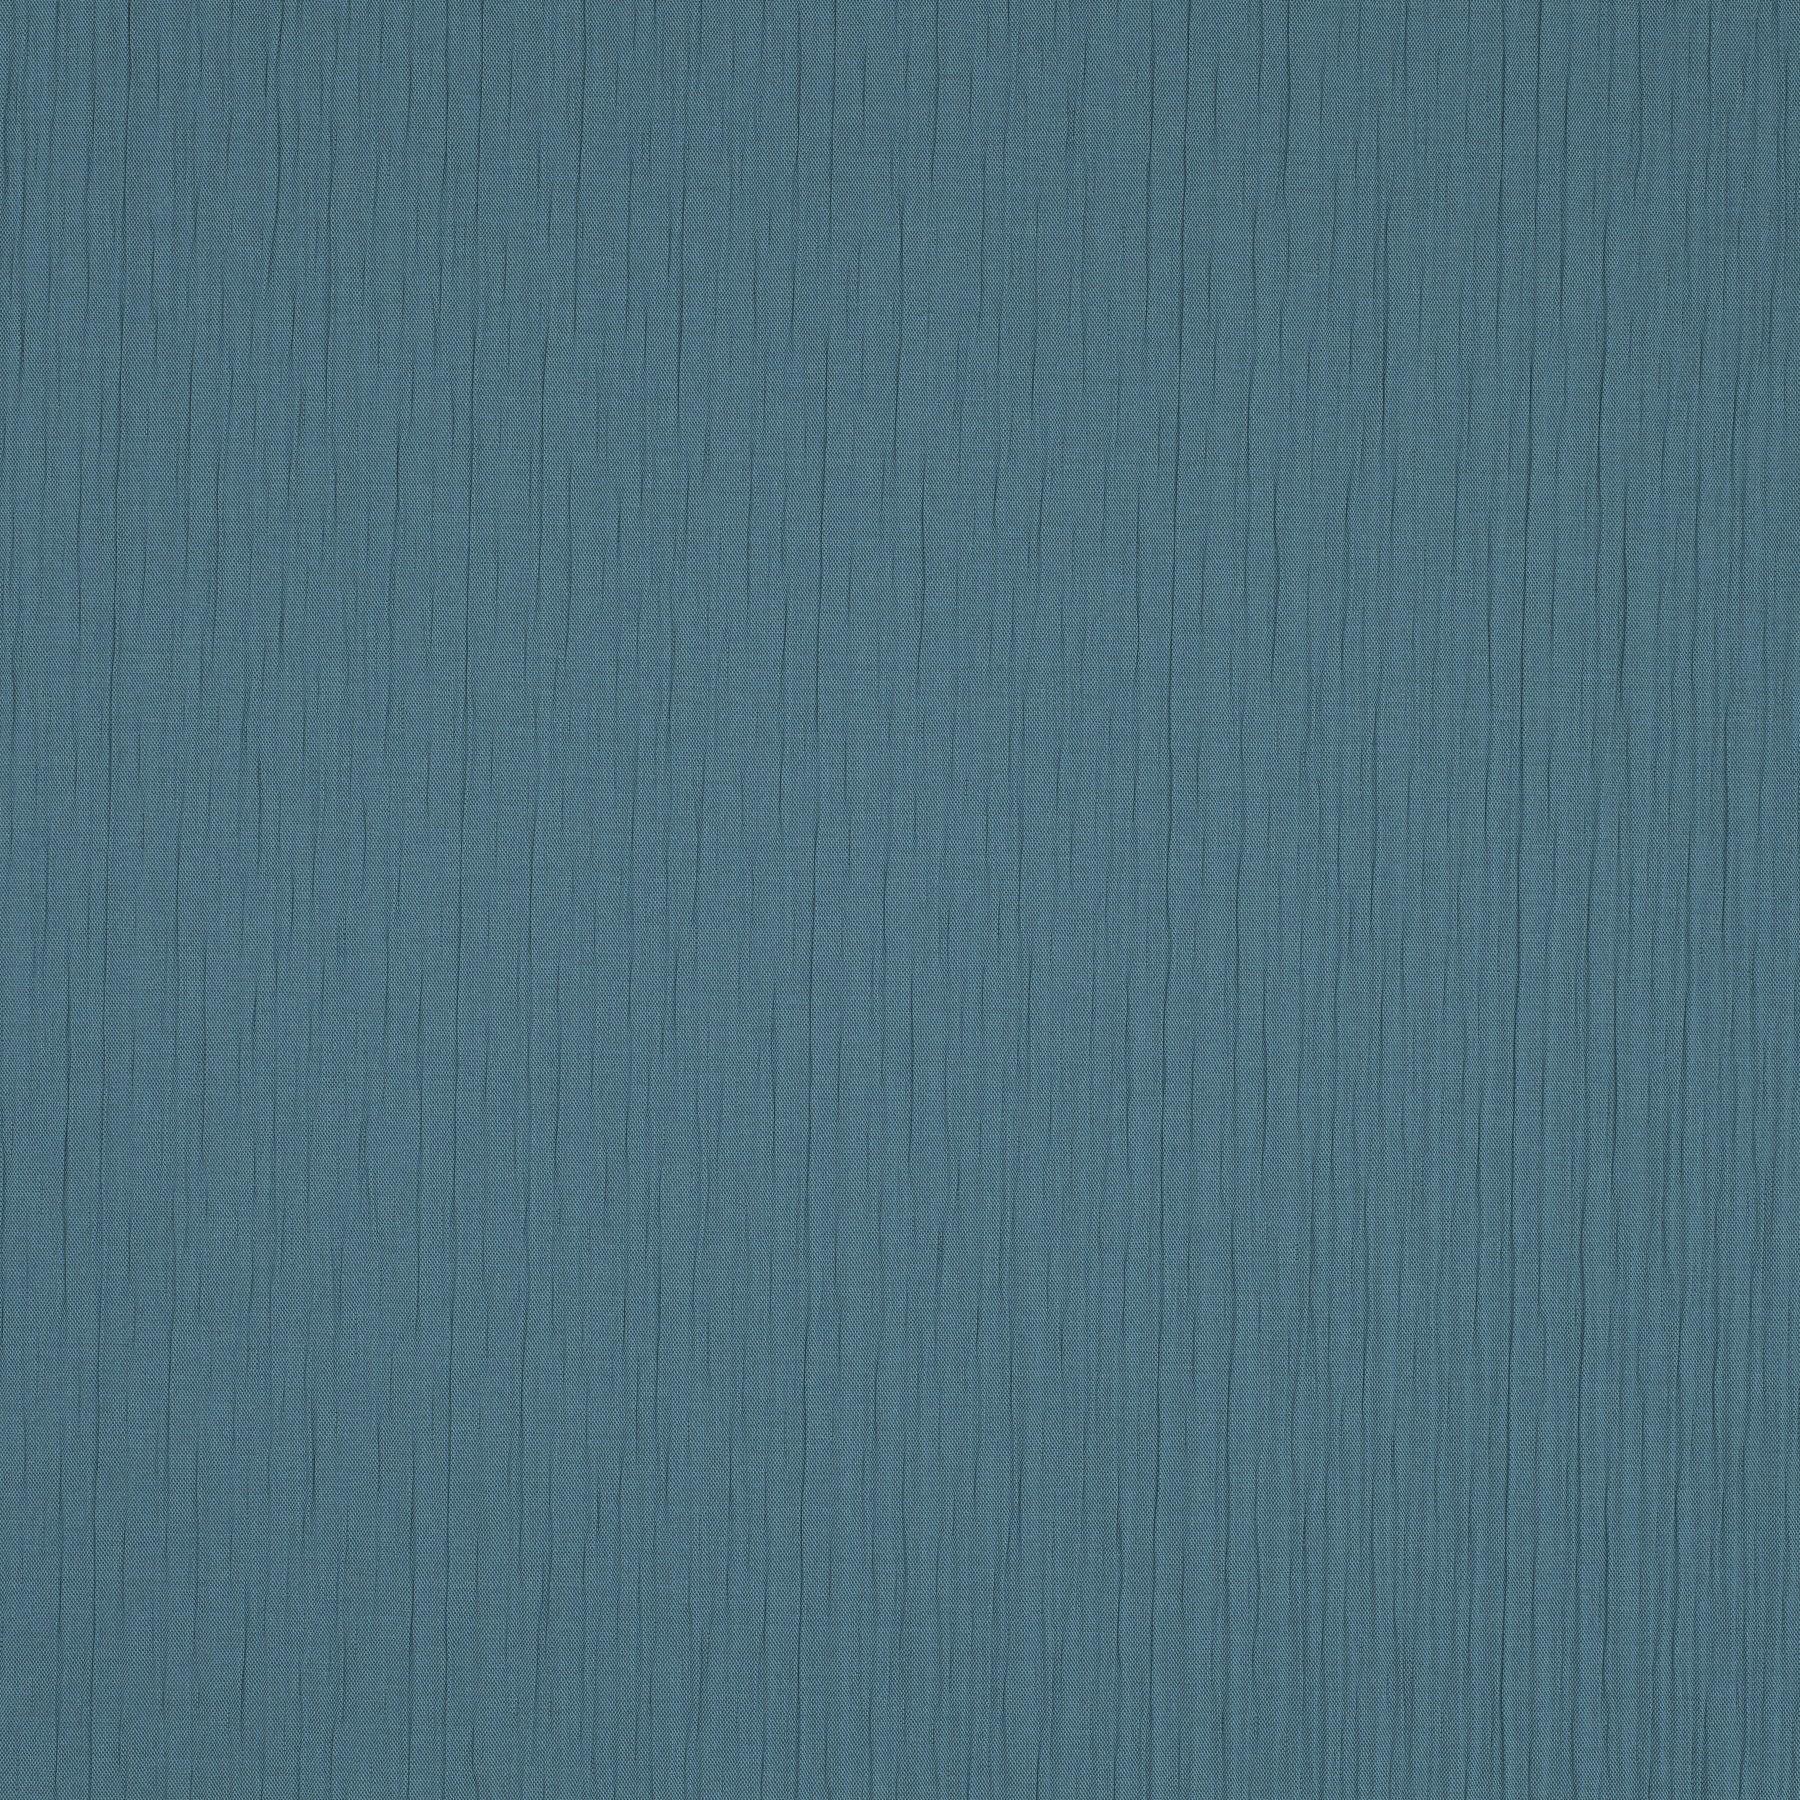 decoration fabric satin crash 1 6829 084 jab anstoetz. Black Bedroom Furniture Sets. Home Design Ideas